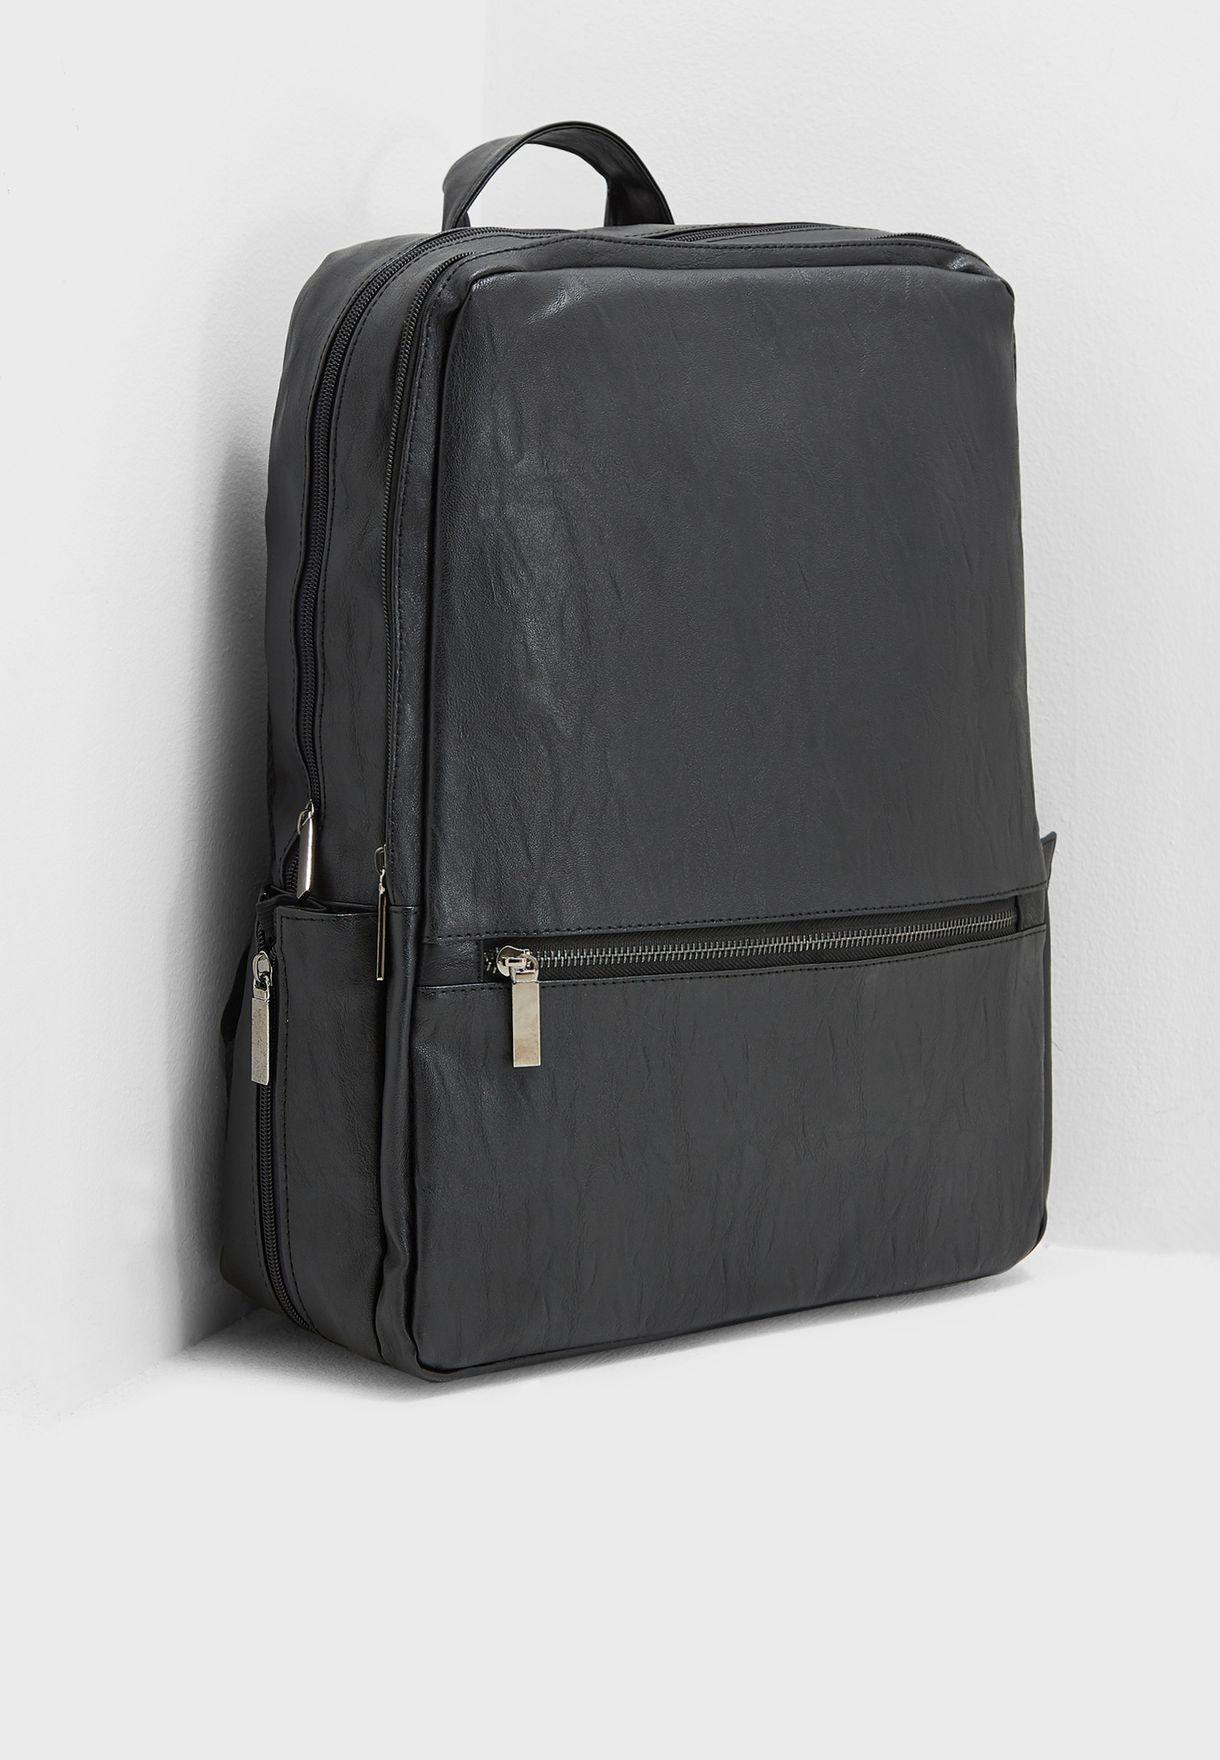 Shop Seventy five black Faux Leather Laptop Sleeve Backpack ... 5401f9c8b74fa